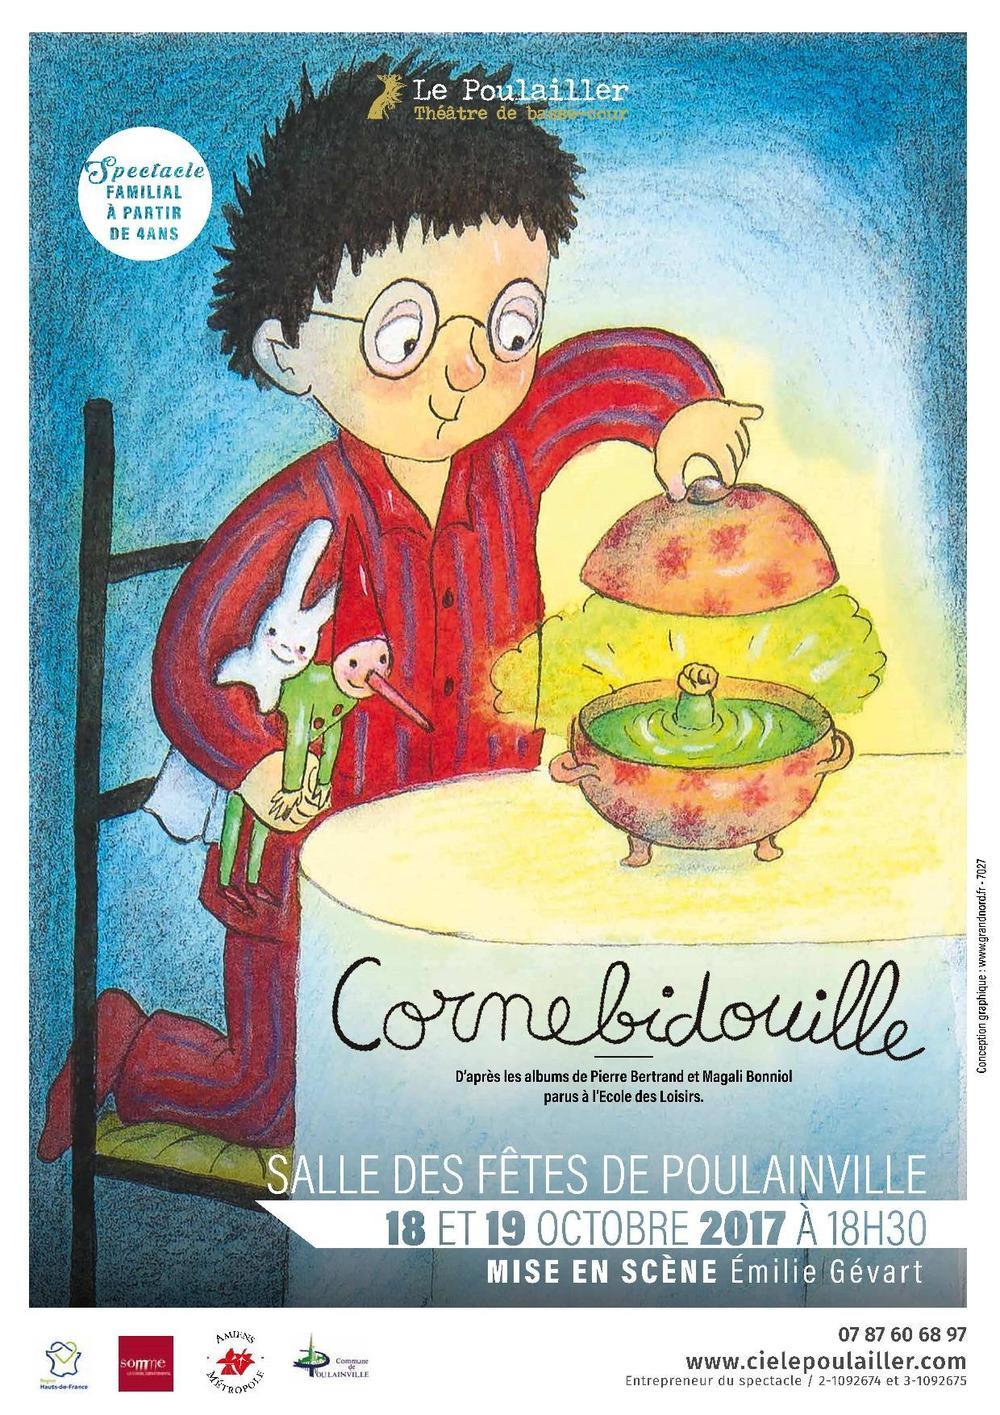 Cornebidouille 20170907113958 1